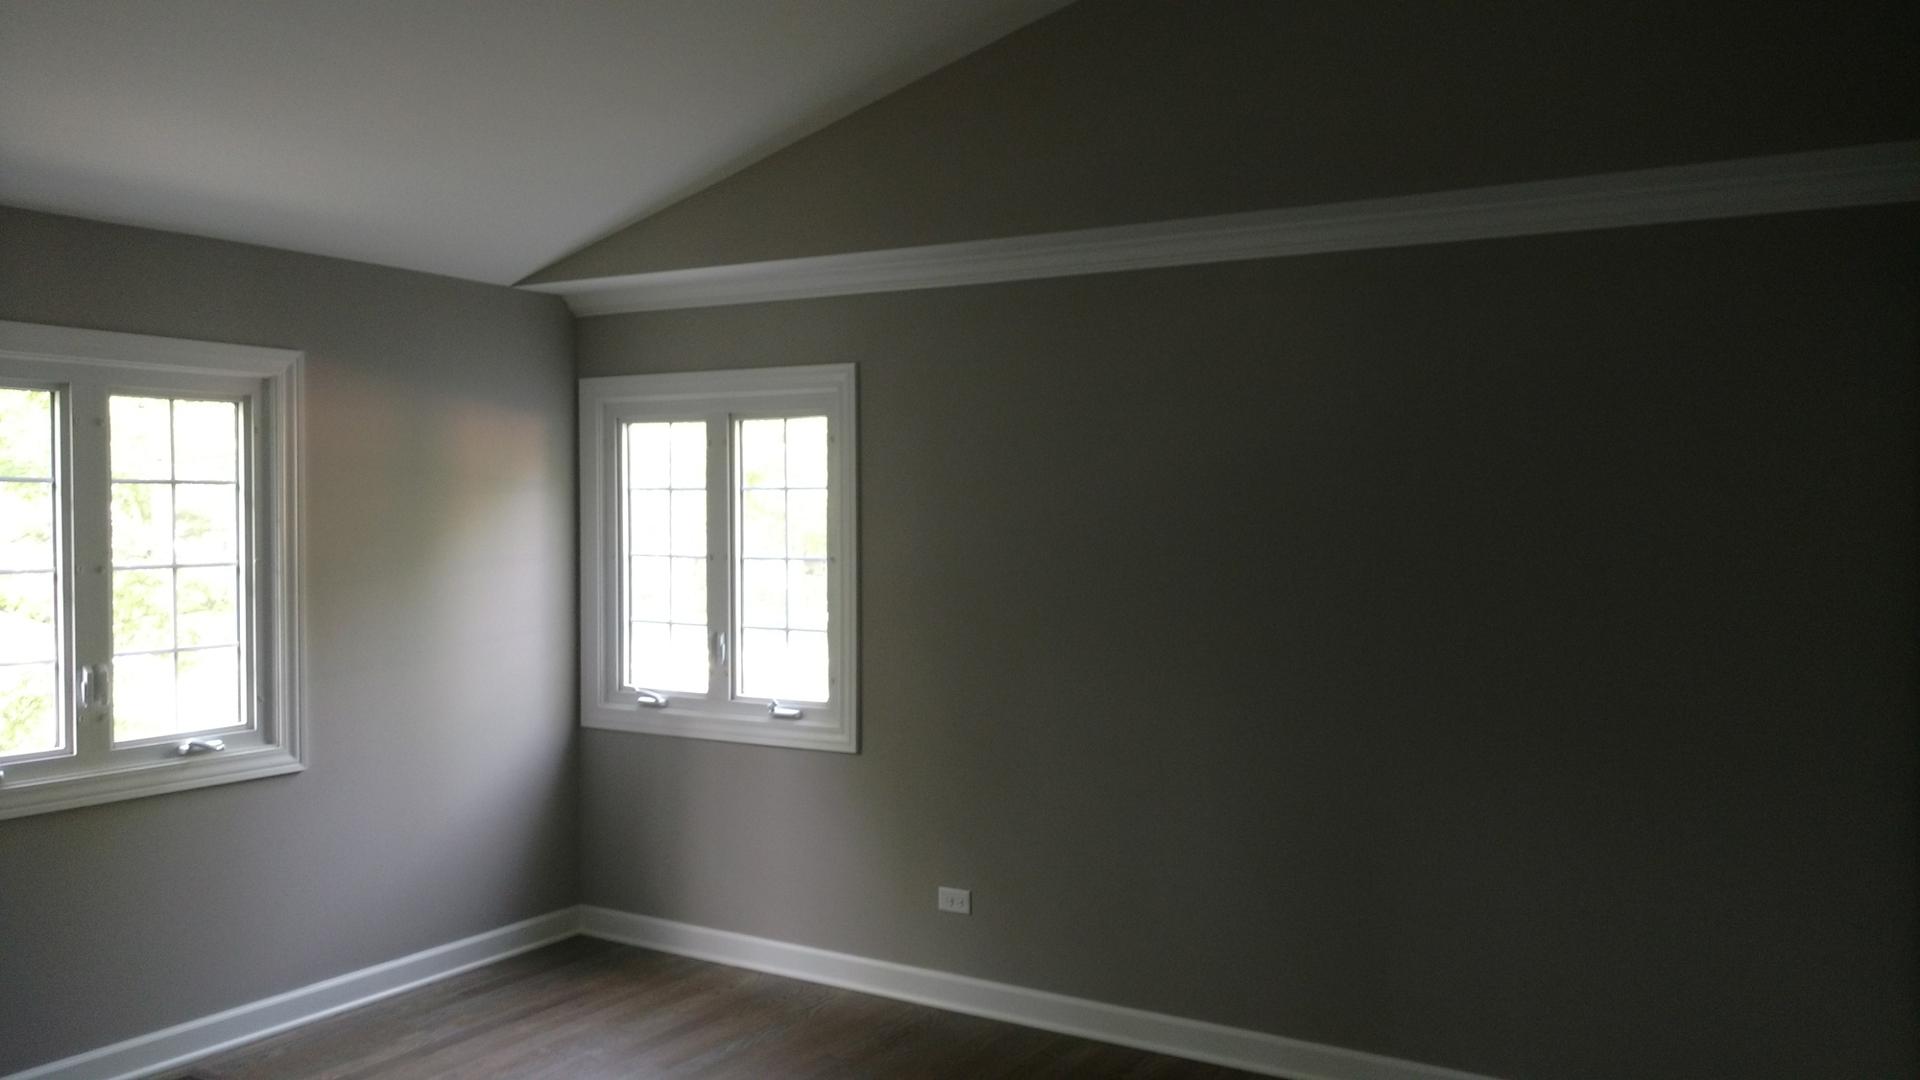 427 Fuller, Hinsdale, Illinois, 60521